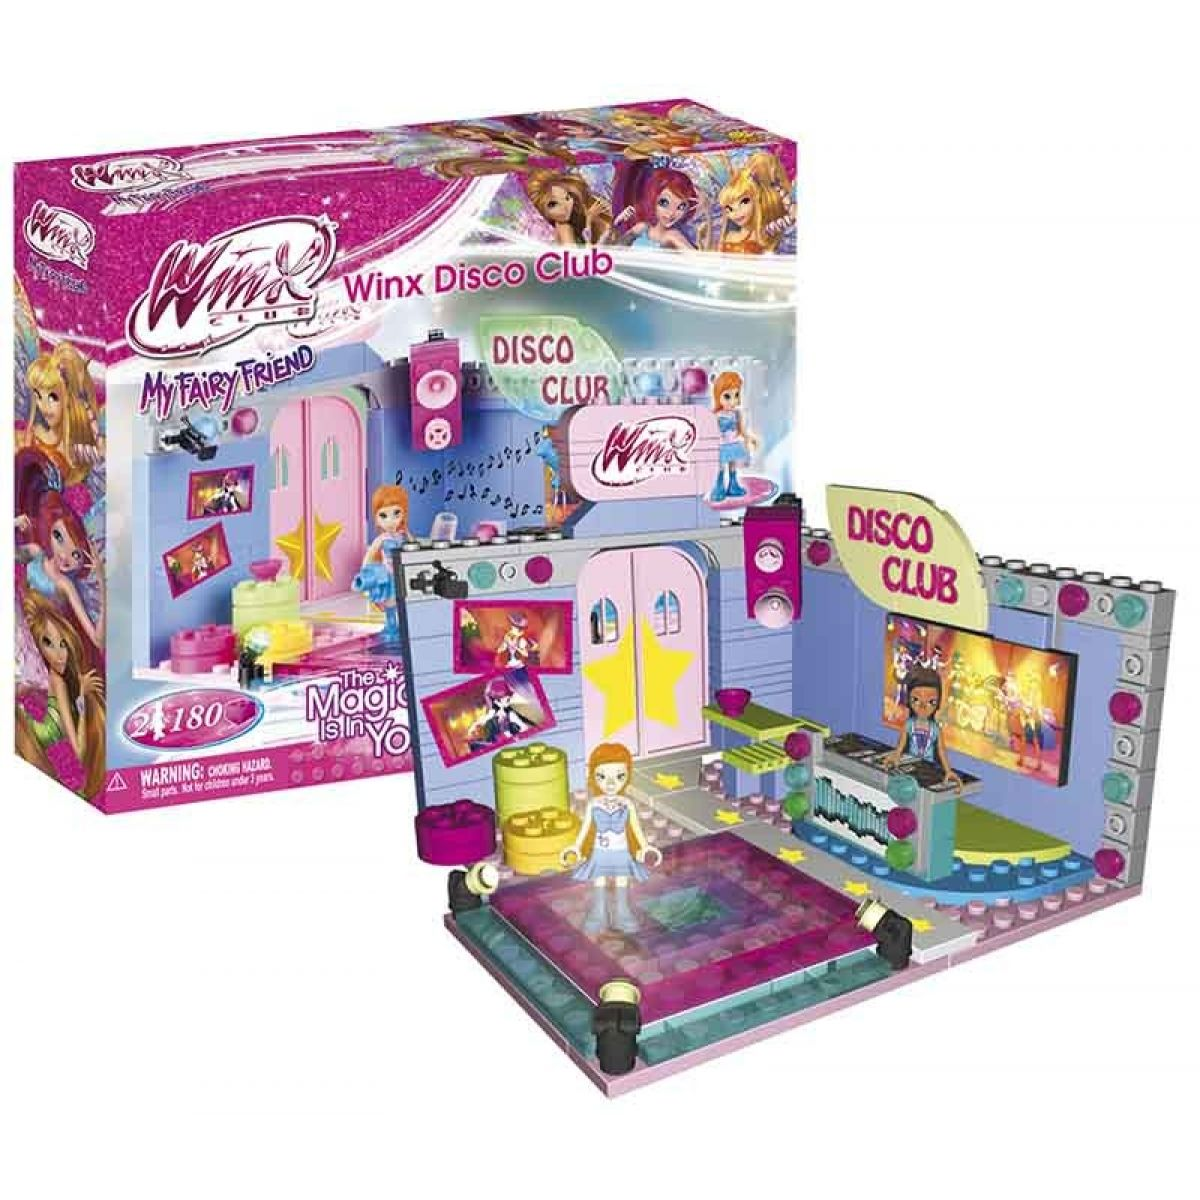 Cobi 25181 - Winx - Disco Club